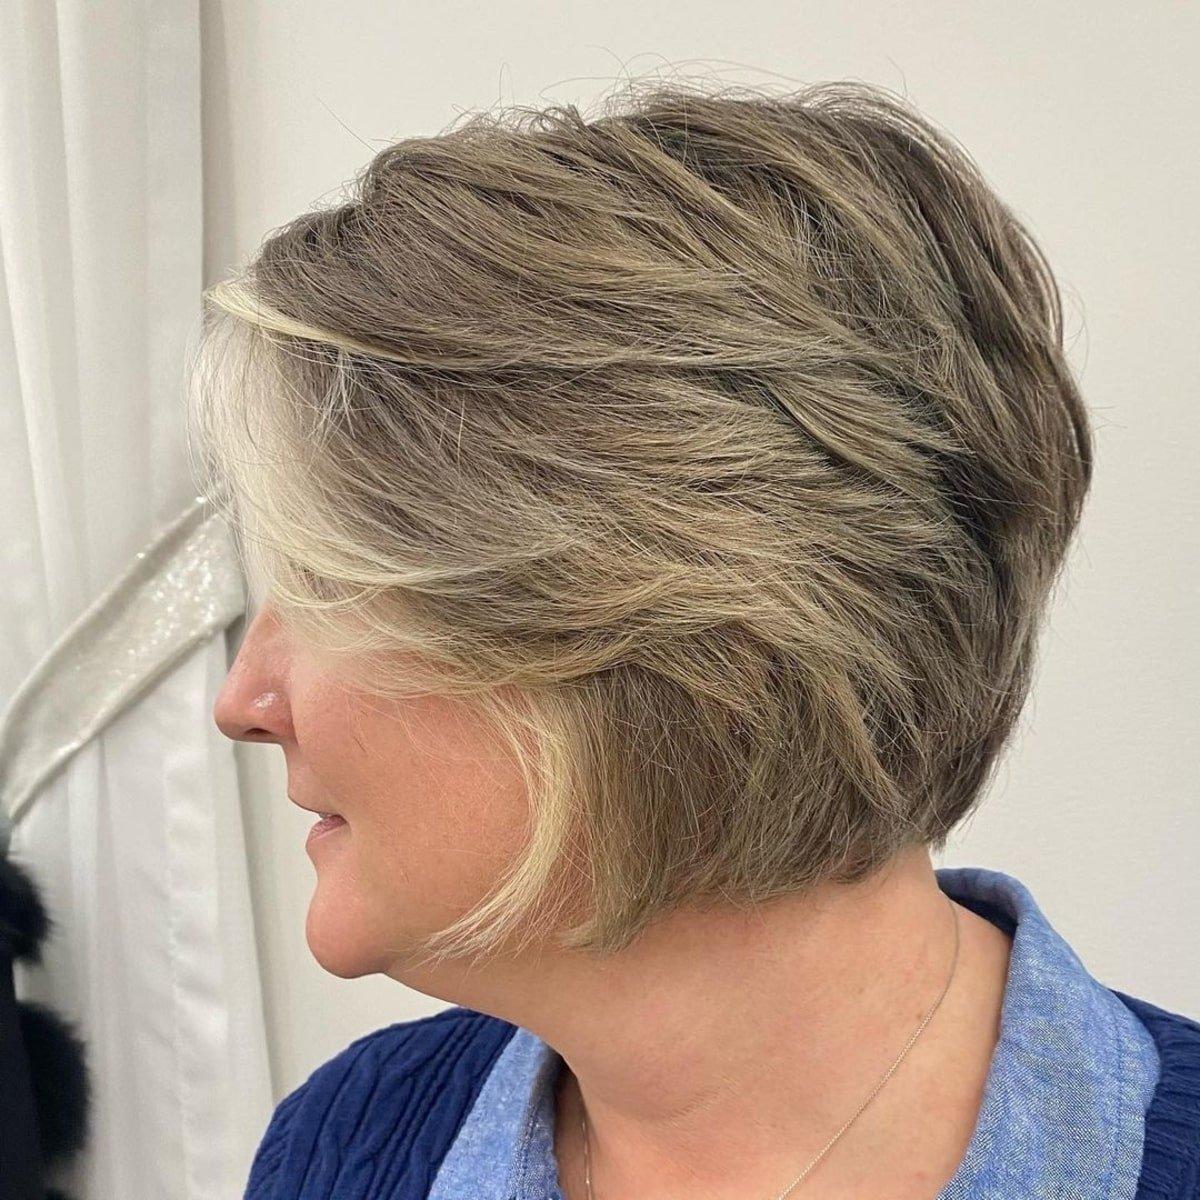 Pixie bob emplumado con flequillo lateral para mujeres mayores de 60 años con cabello fino